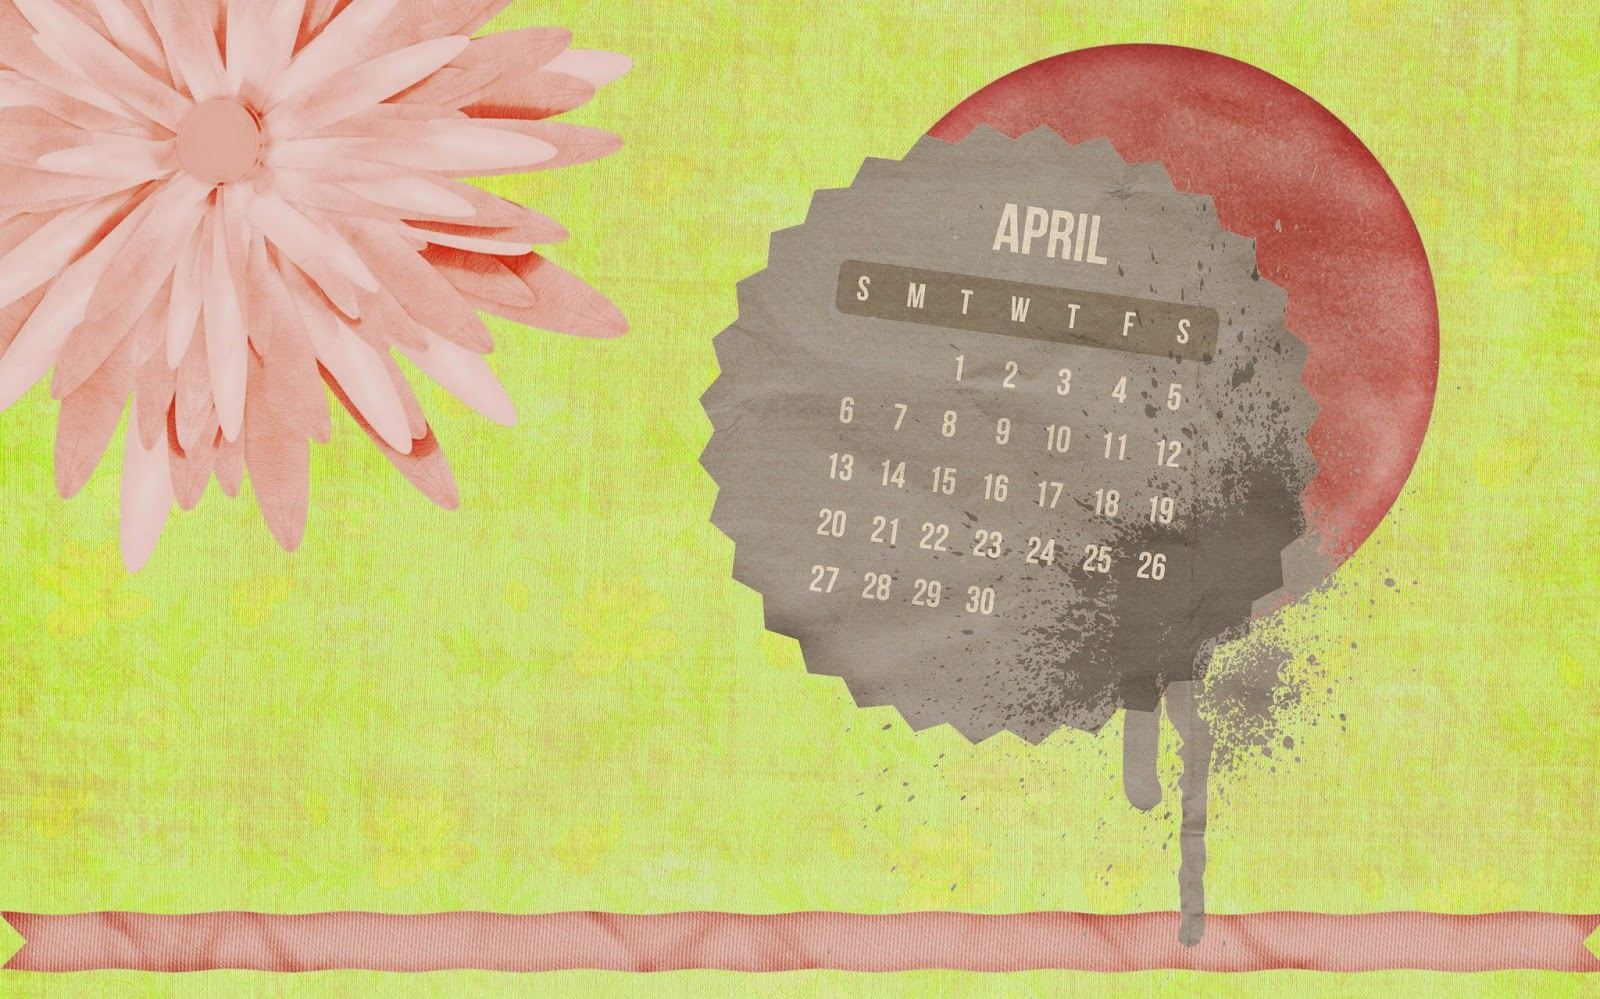 related april 2014 calendar april 2014 calendar background april ...